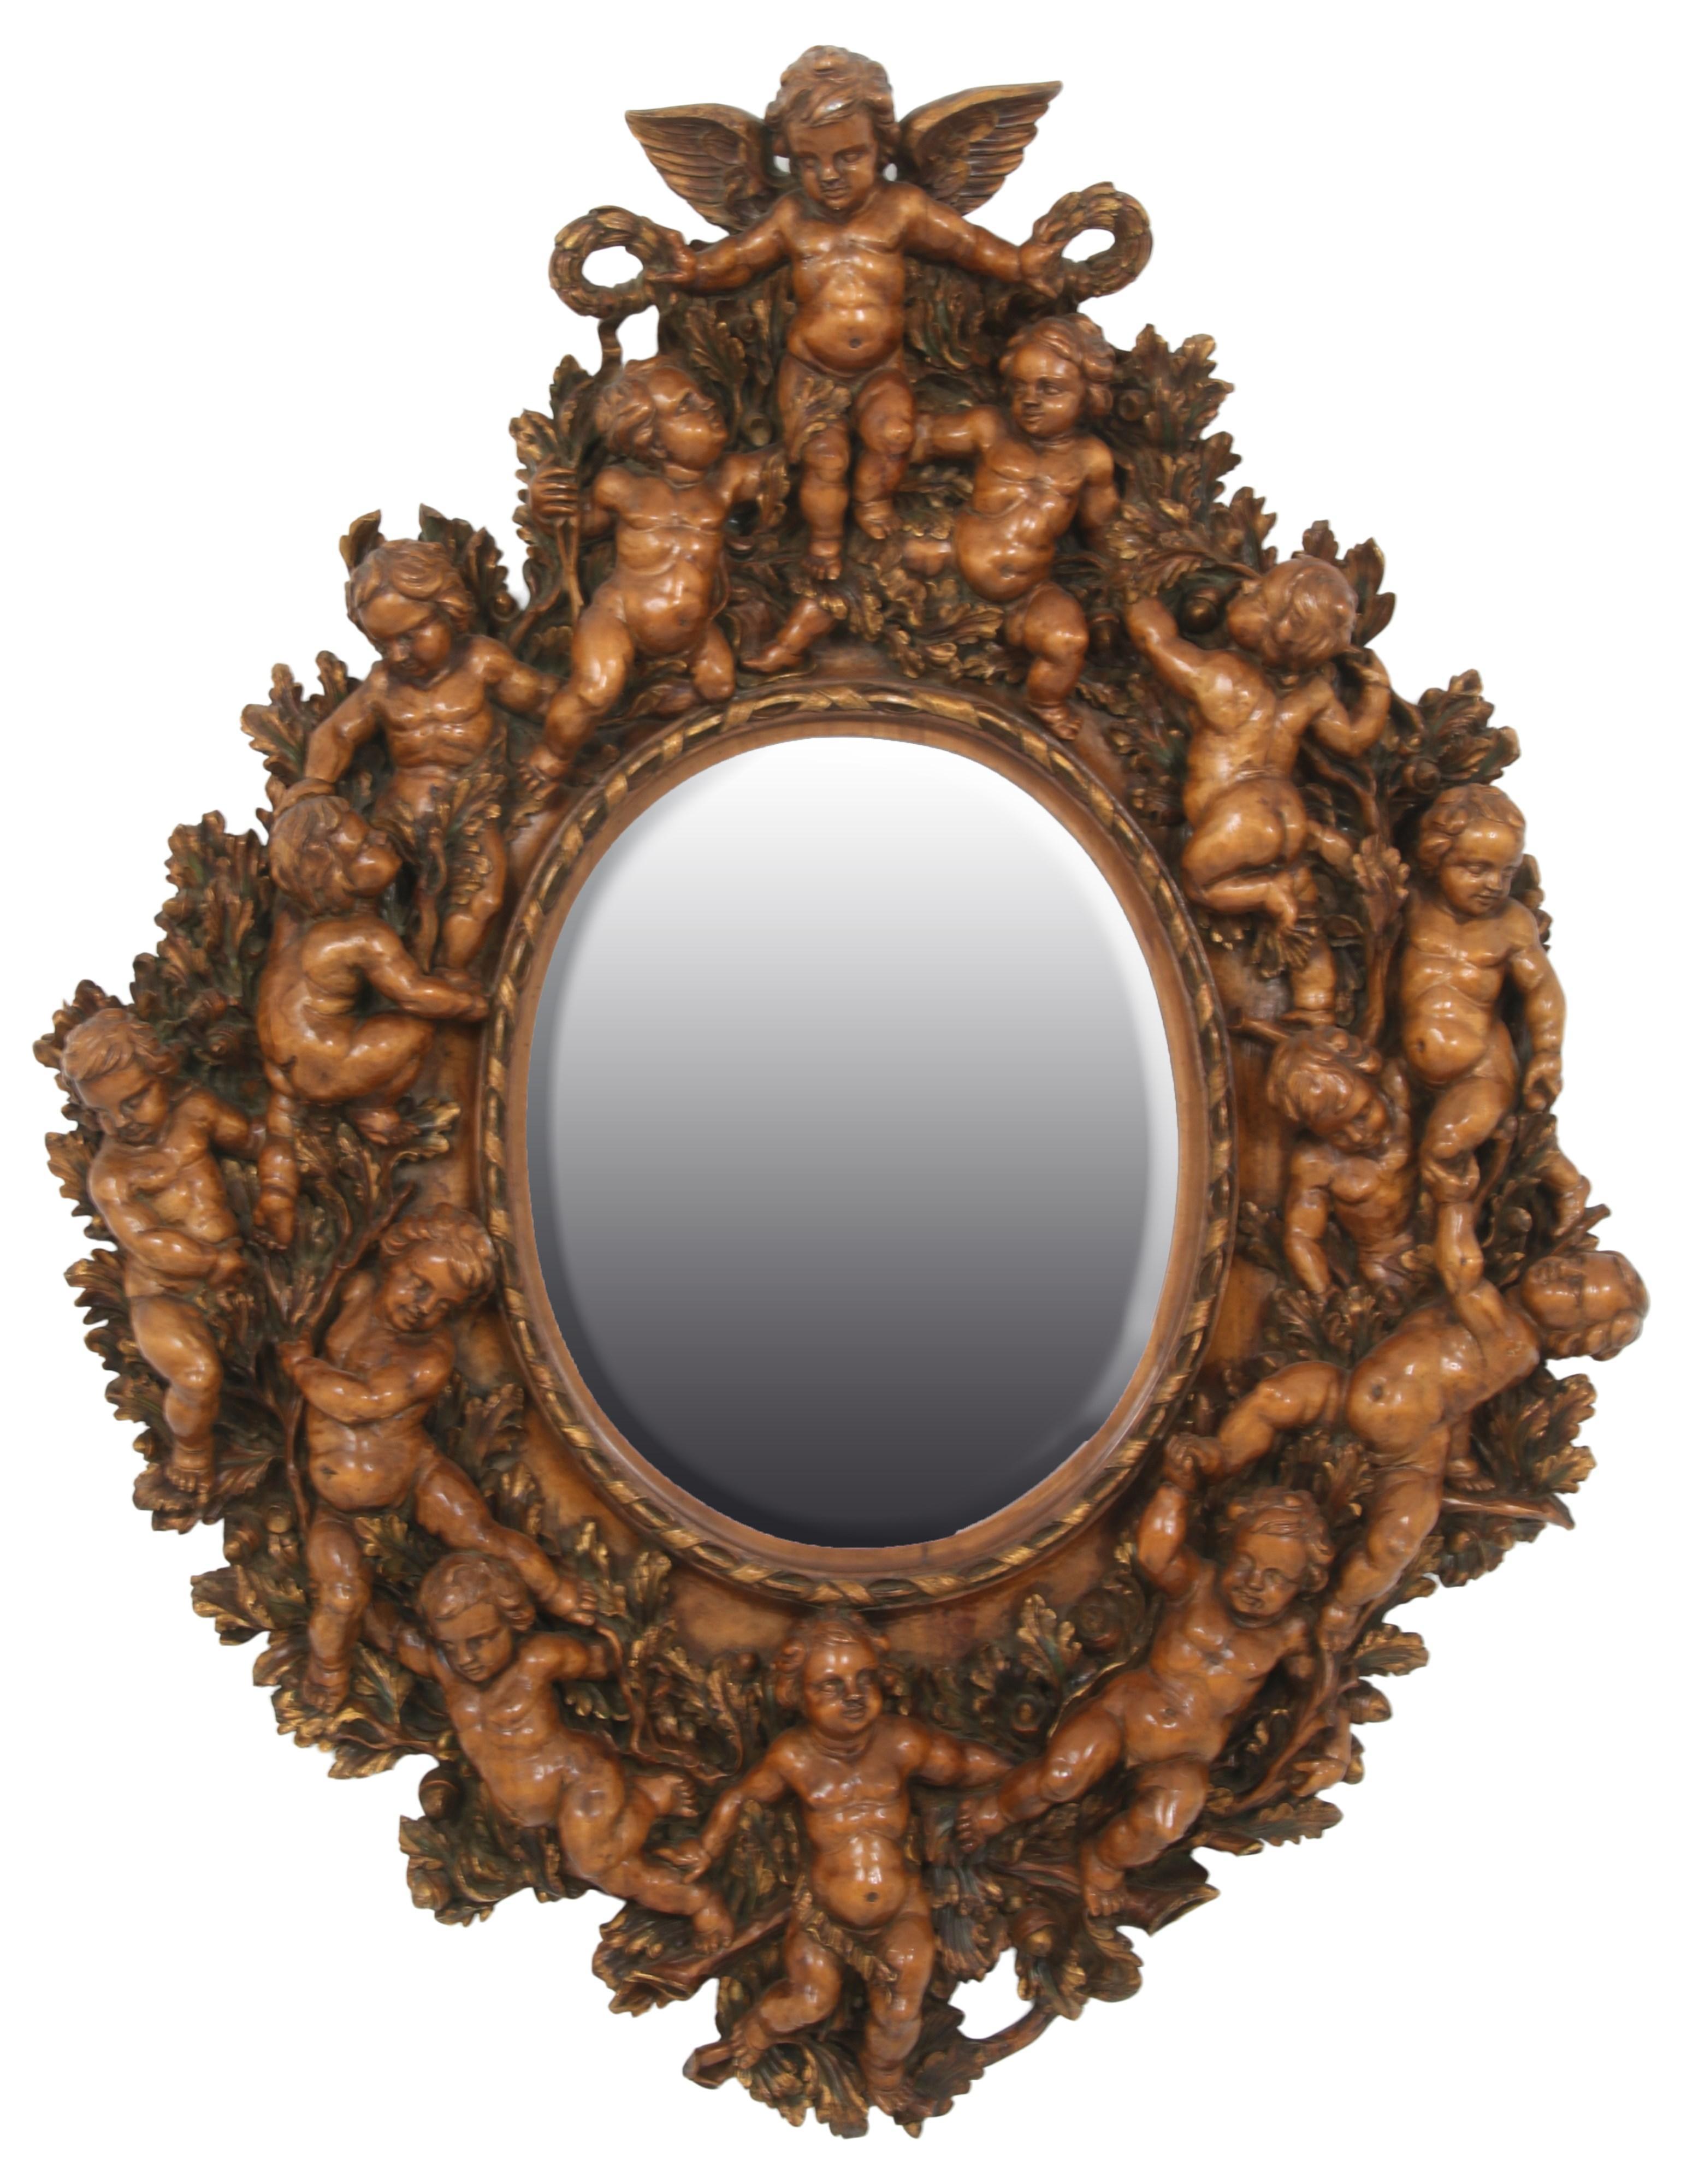 Studio of Valentino Besarel, Cherub Mirror